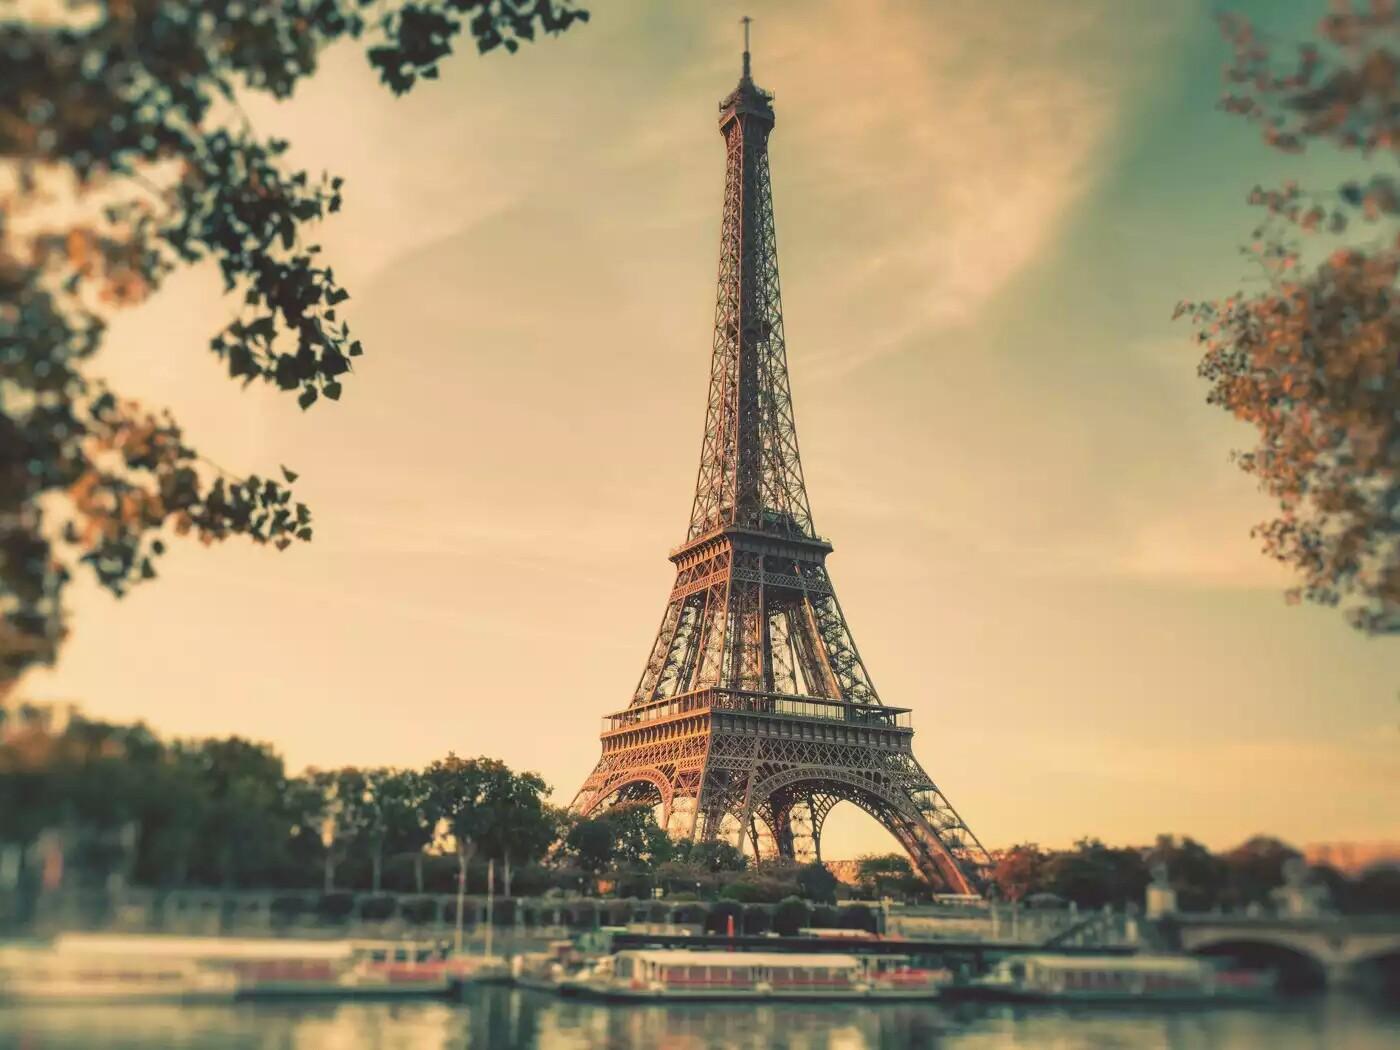 [71+] Eiffel Tower Backgrounds On WallpaperSafari